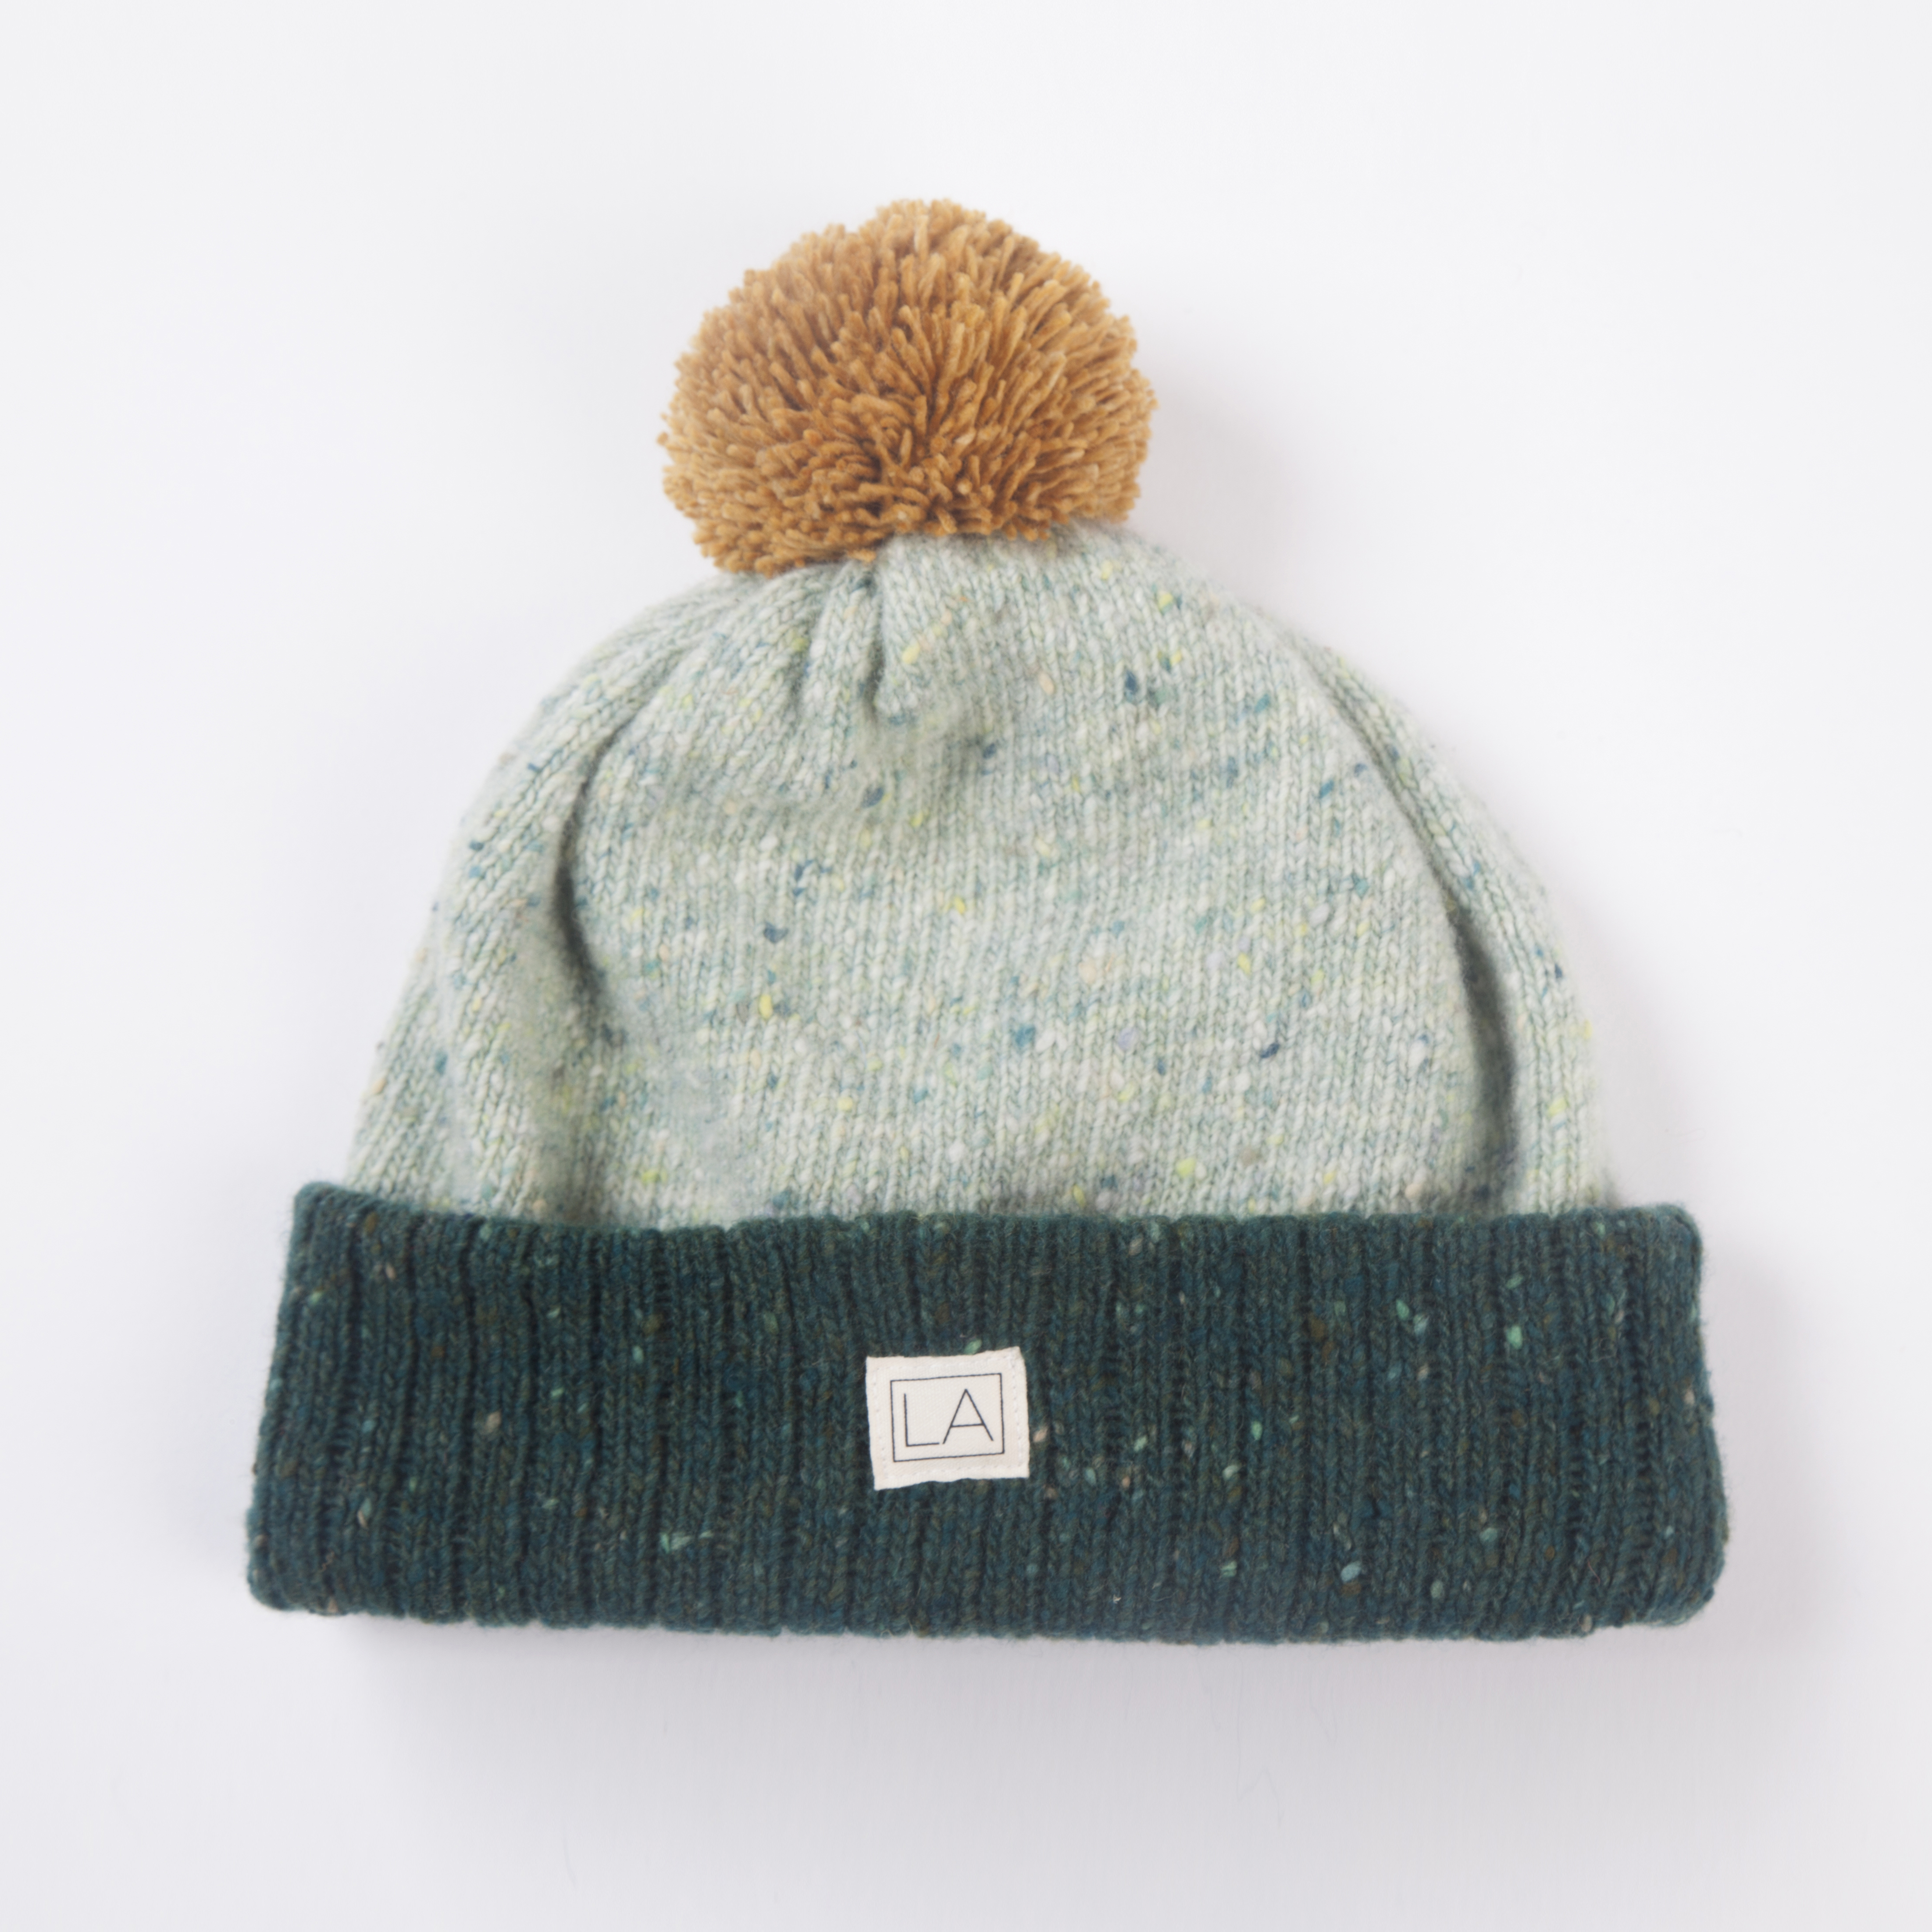 c6a18cfd91a Bespoke Merino Wool Adult Hats